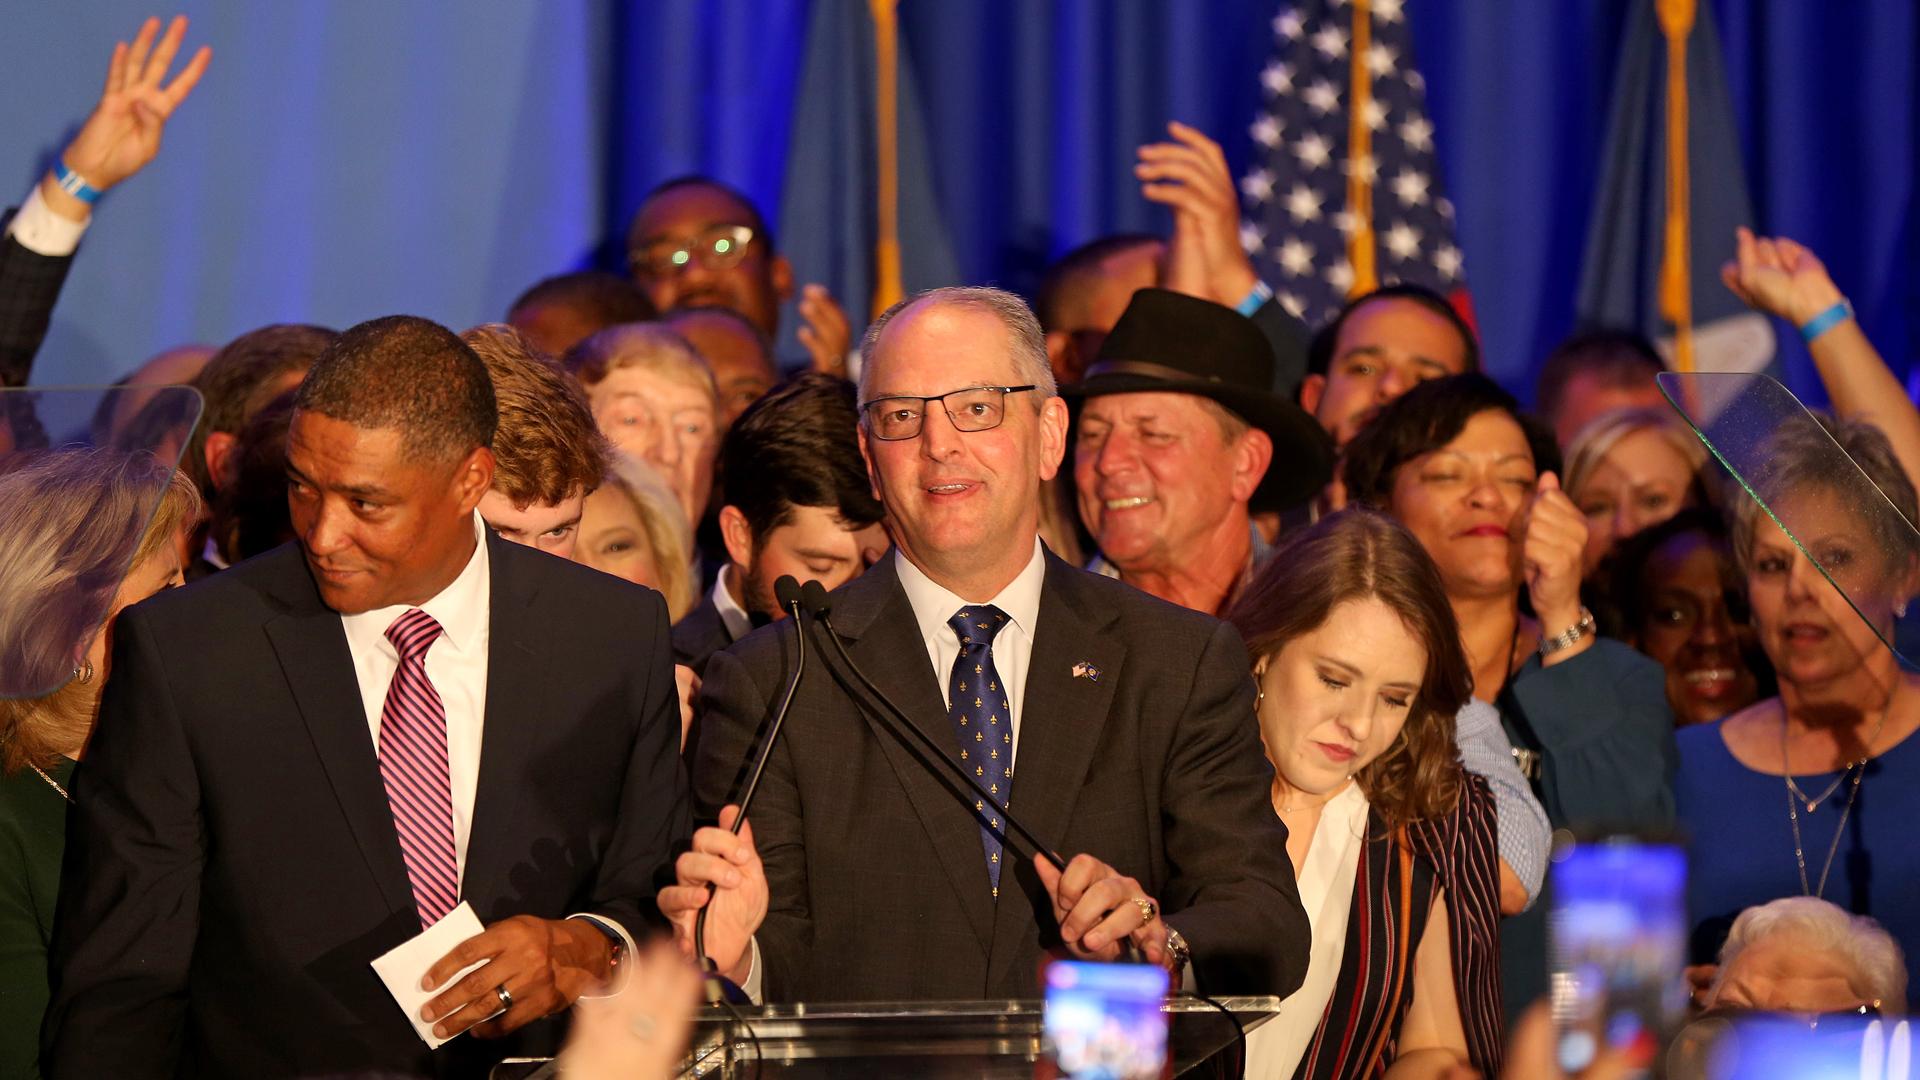 Democratic incumbent Governor John Bel Edwards speaks to a crowd at the Renaissance Baton Rouge Hotel on November 16, 2019 in Baton Rouge, Louisiana. (Credit: Matt Sullivan/Getty Images)